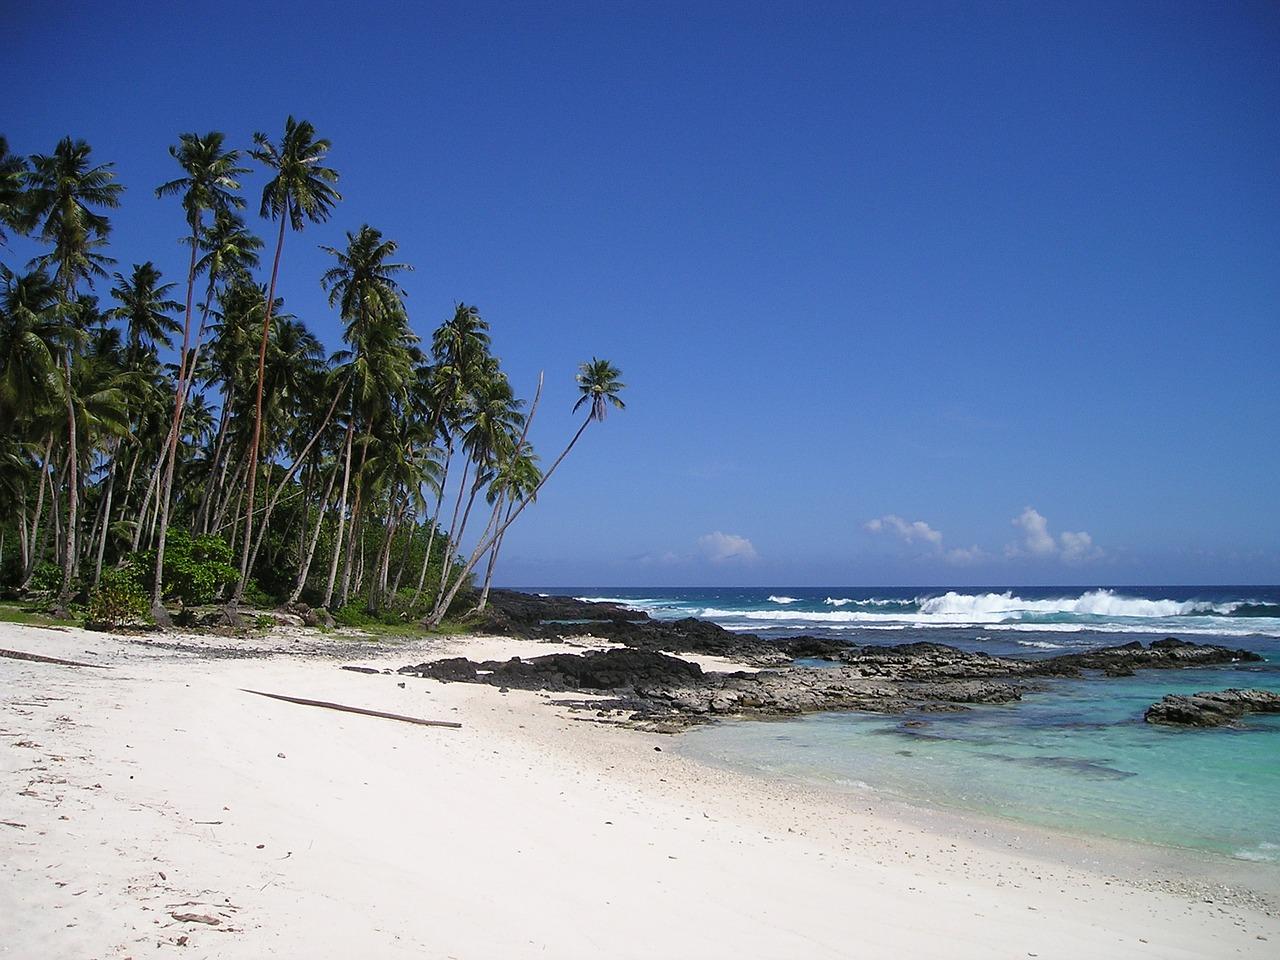 Kuba Urlaub 2015 Rundreise Strand Meer